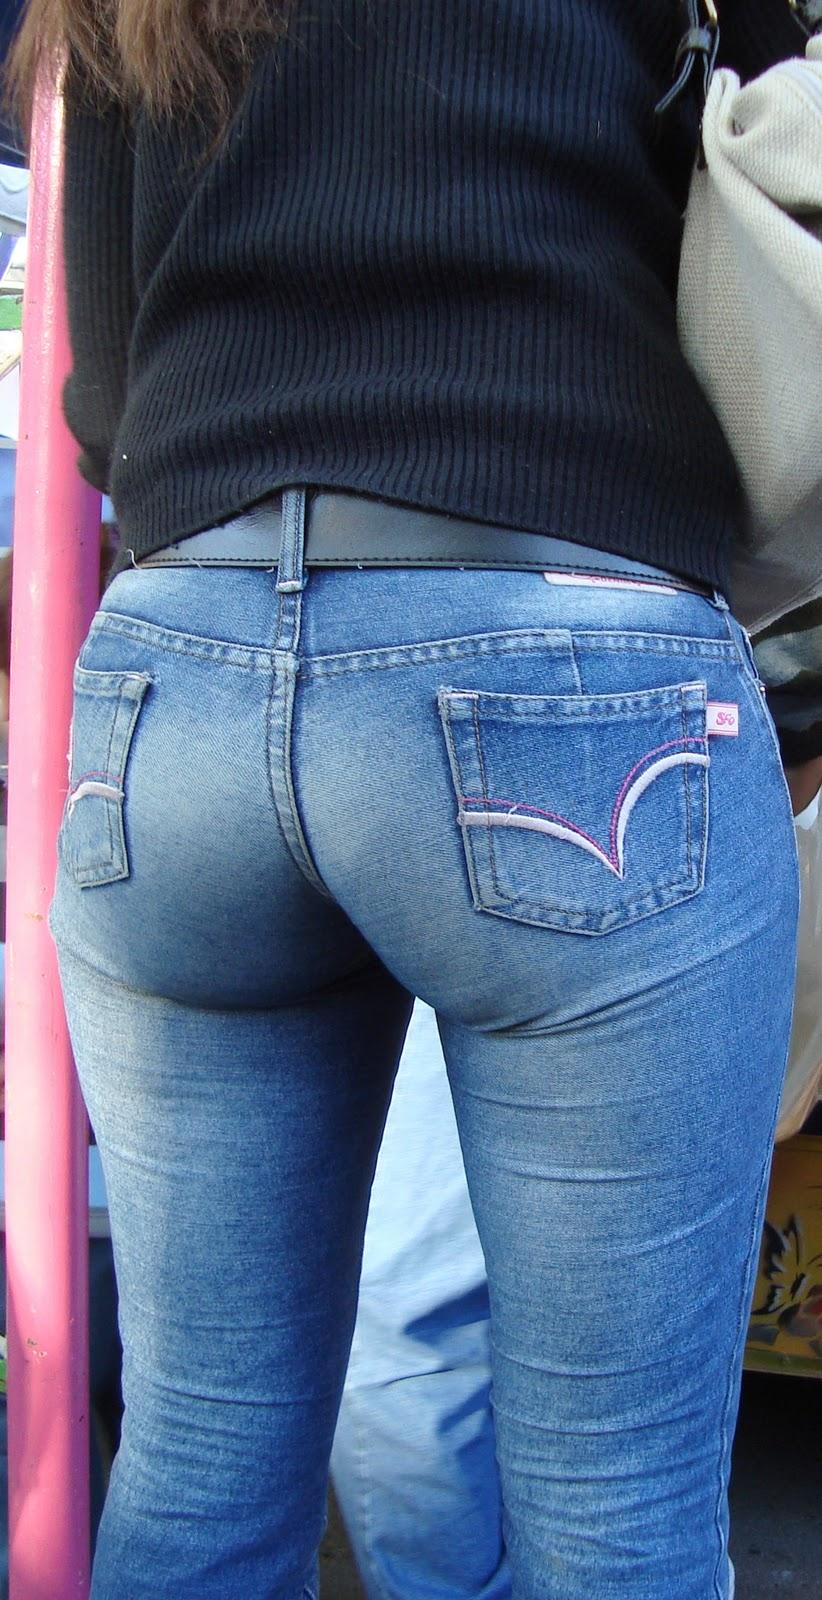 Nice milf ass in jeans